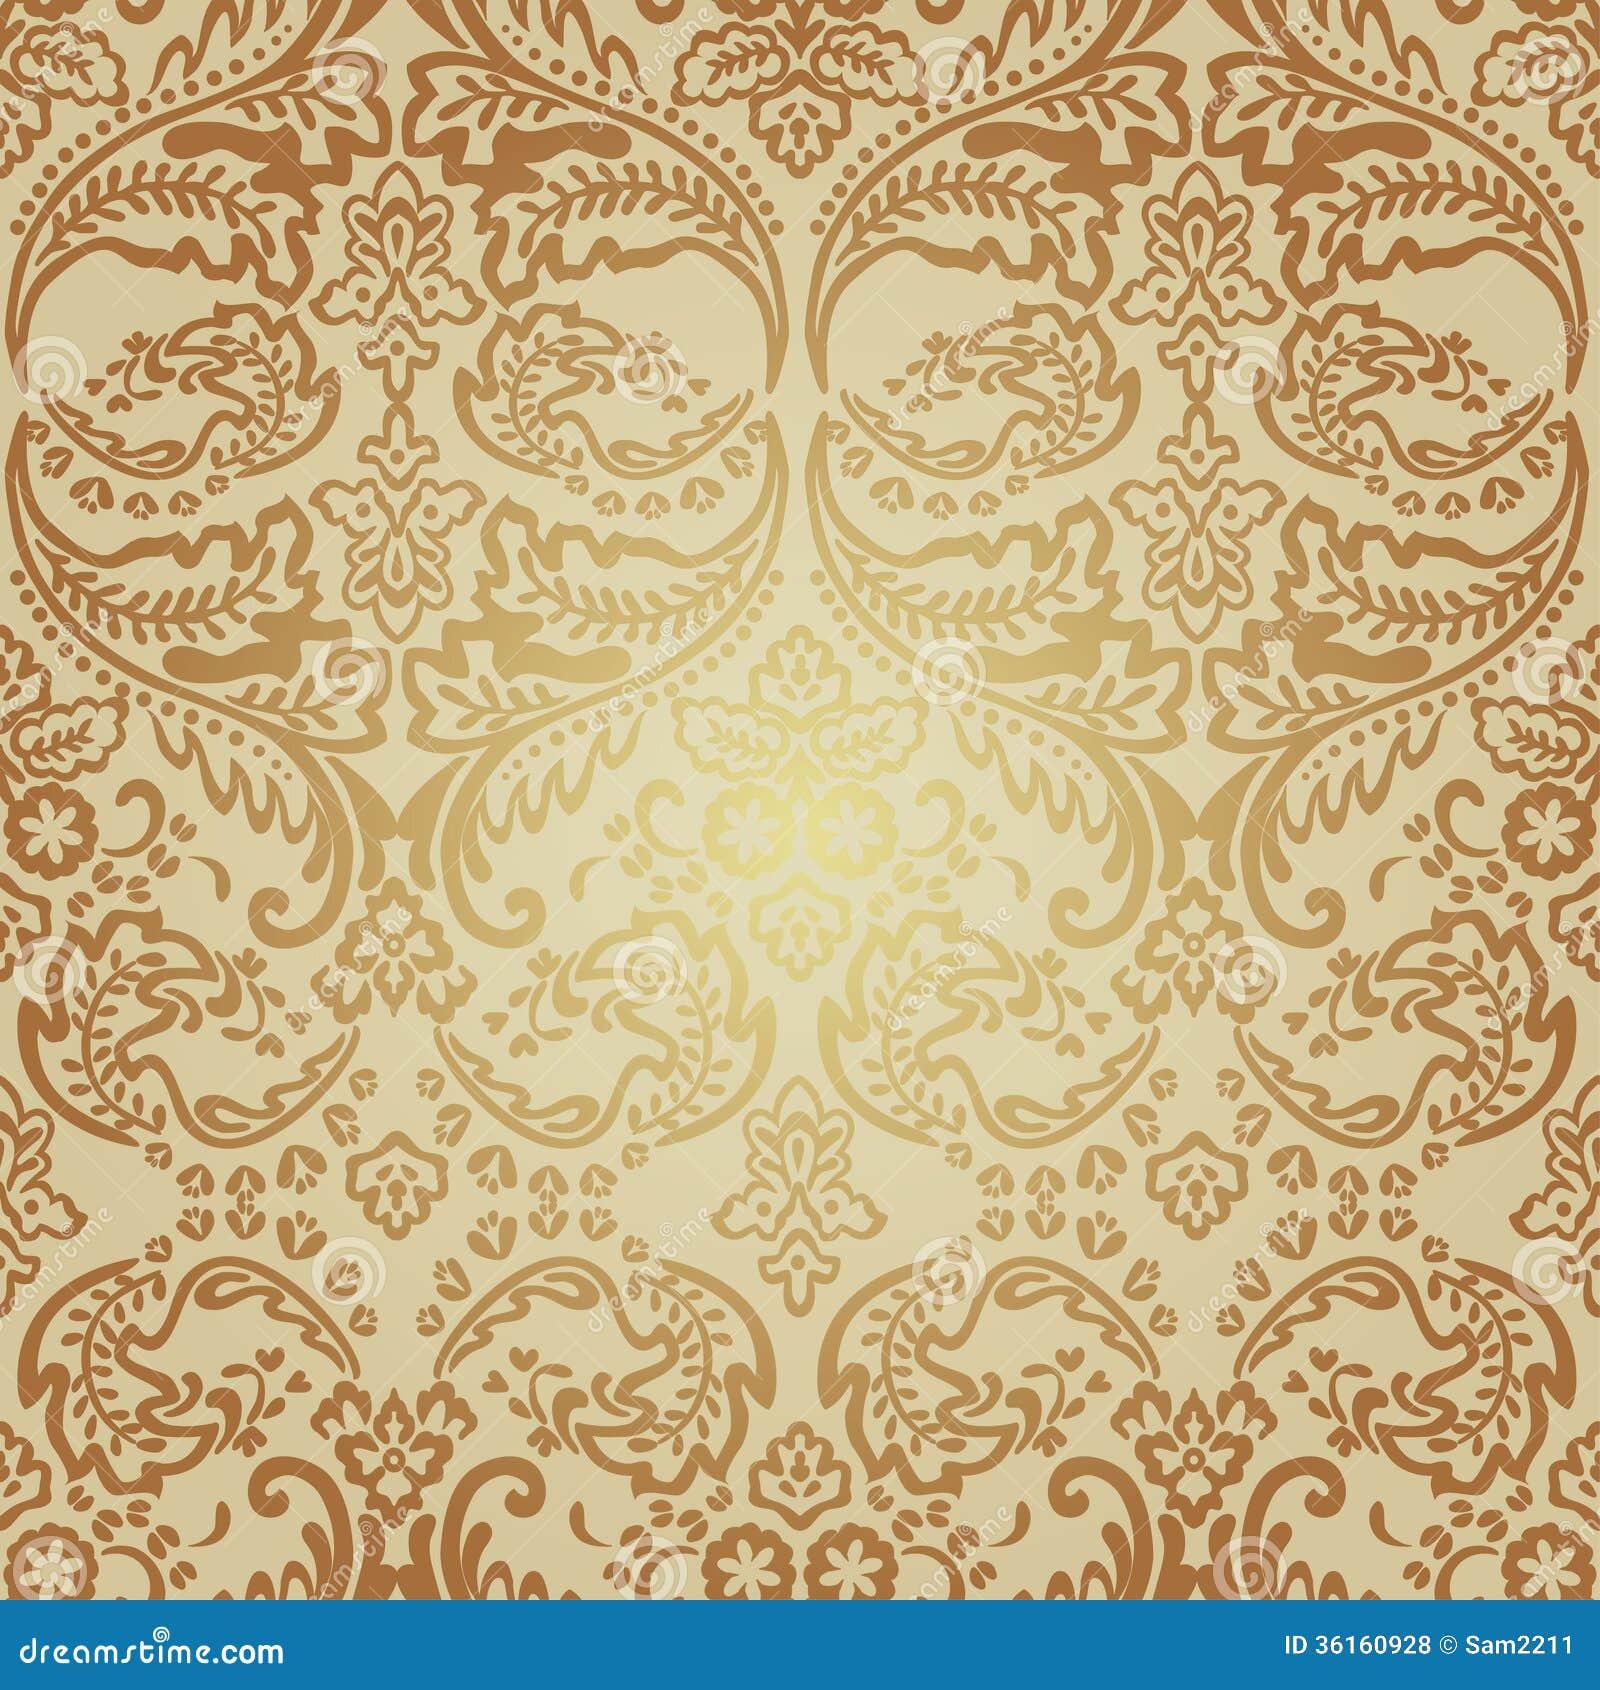 Versace Chair Seamless Pattern Background Damask Wallpaper Royalty Free